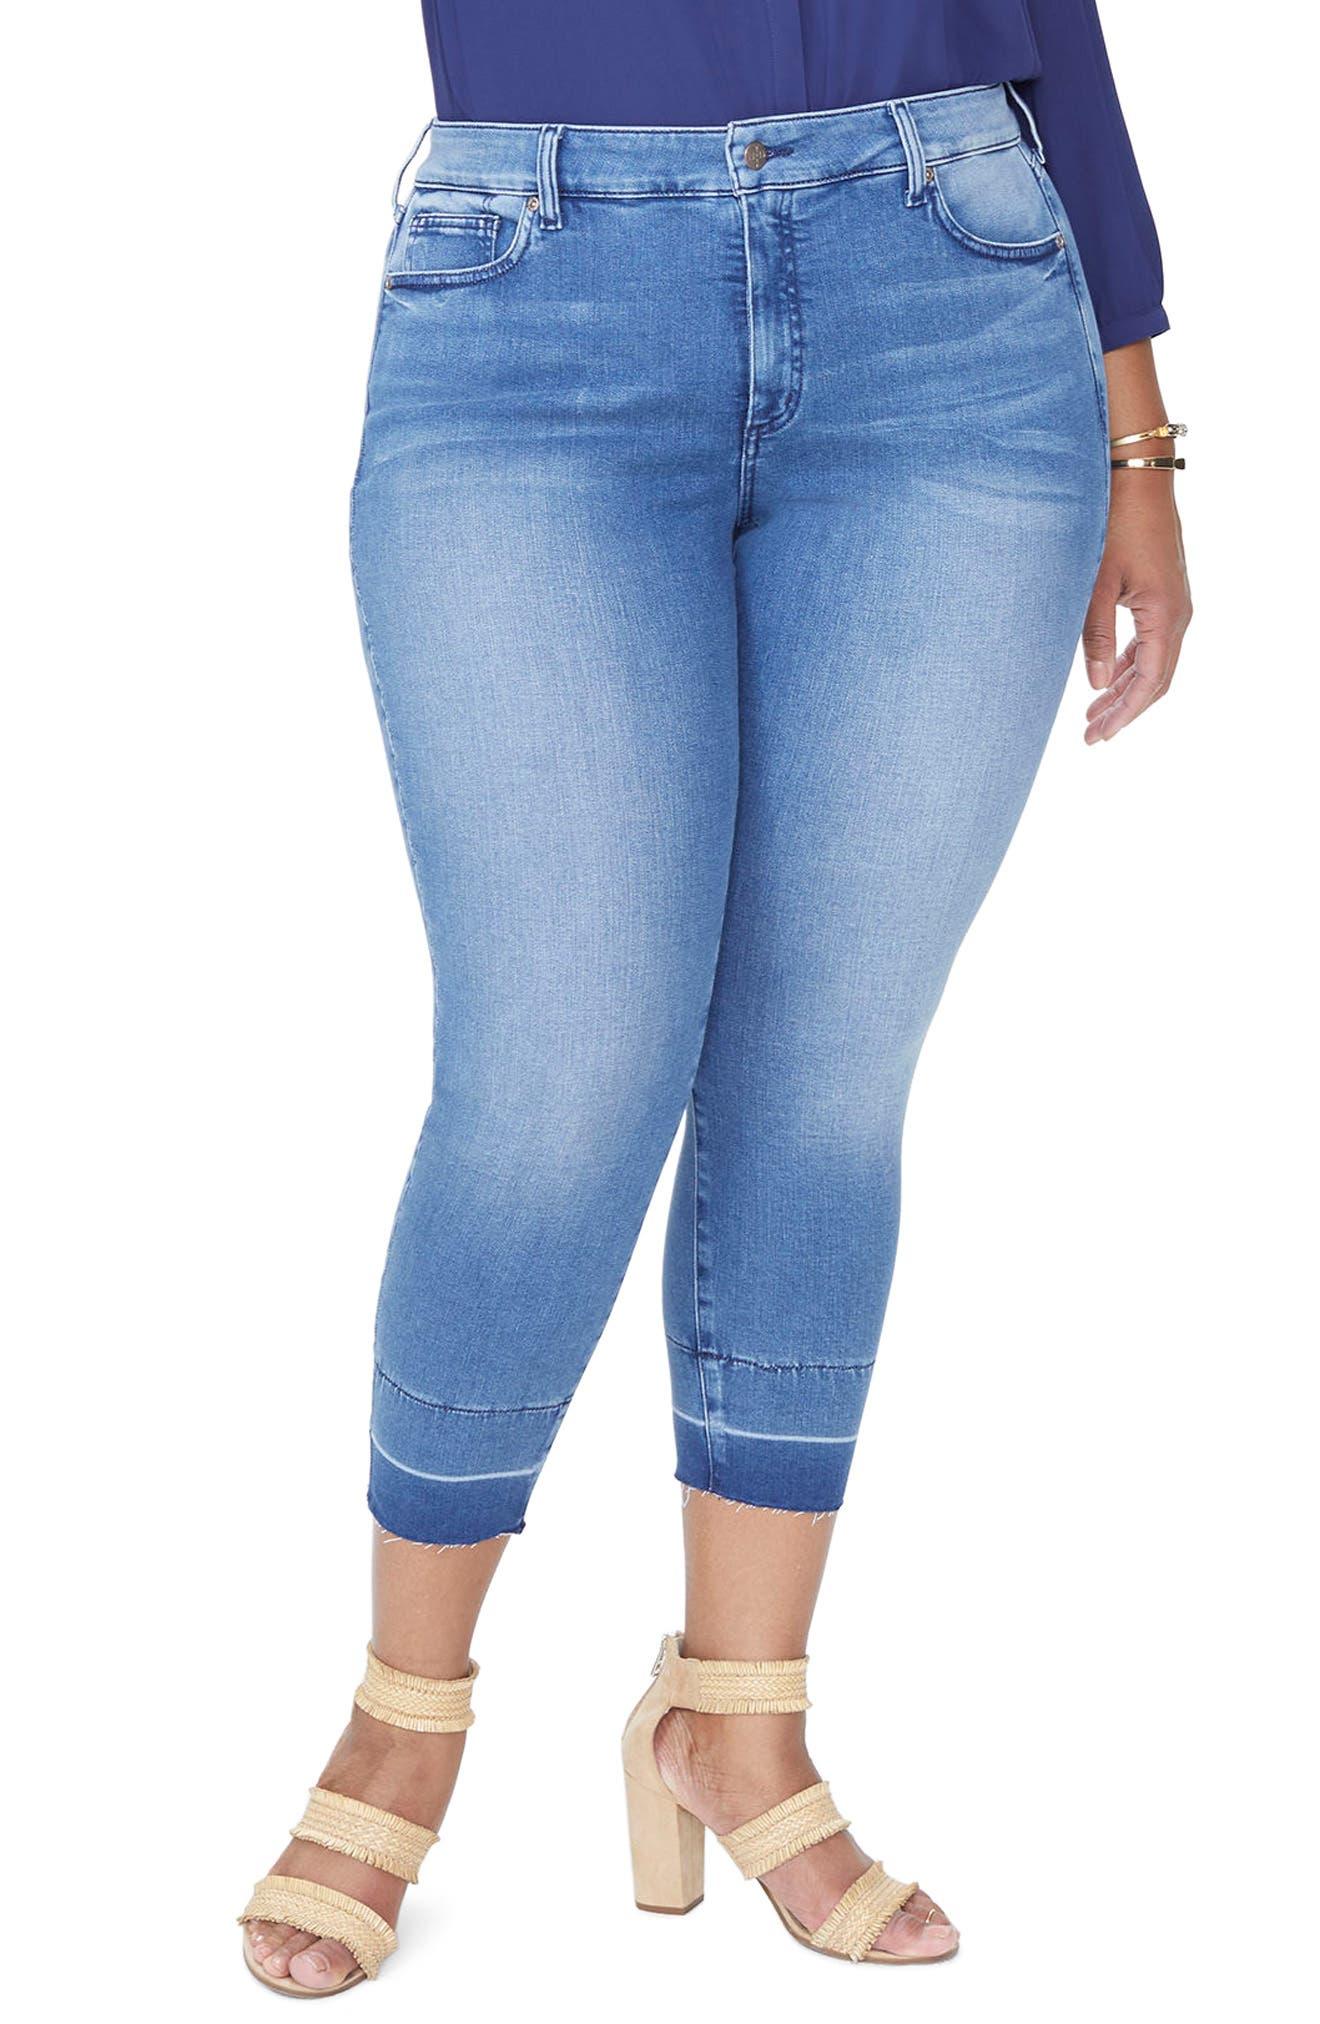 Alina Release Hem Ankle Skinny Jeans,                             Main thumbnail 1, color,                             410